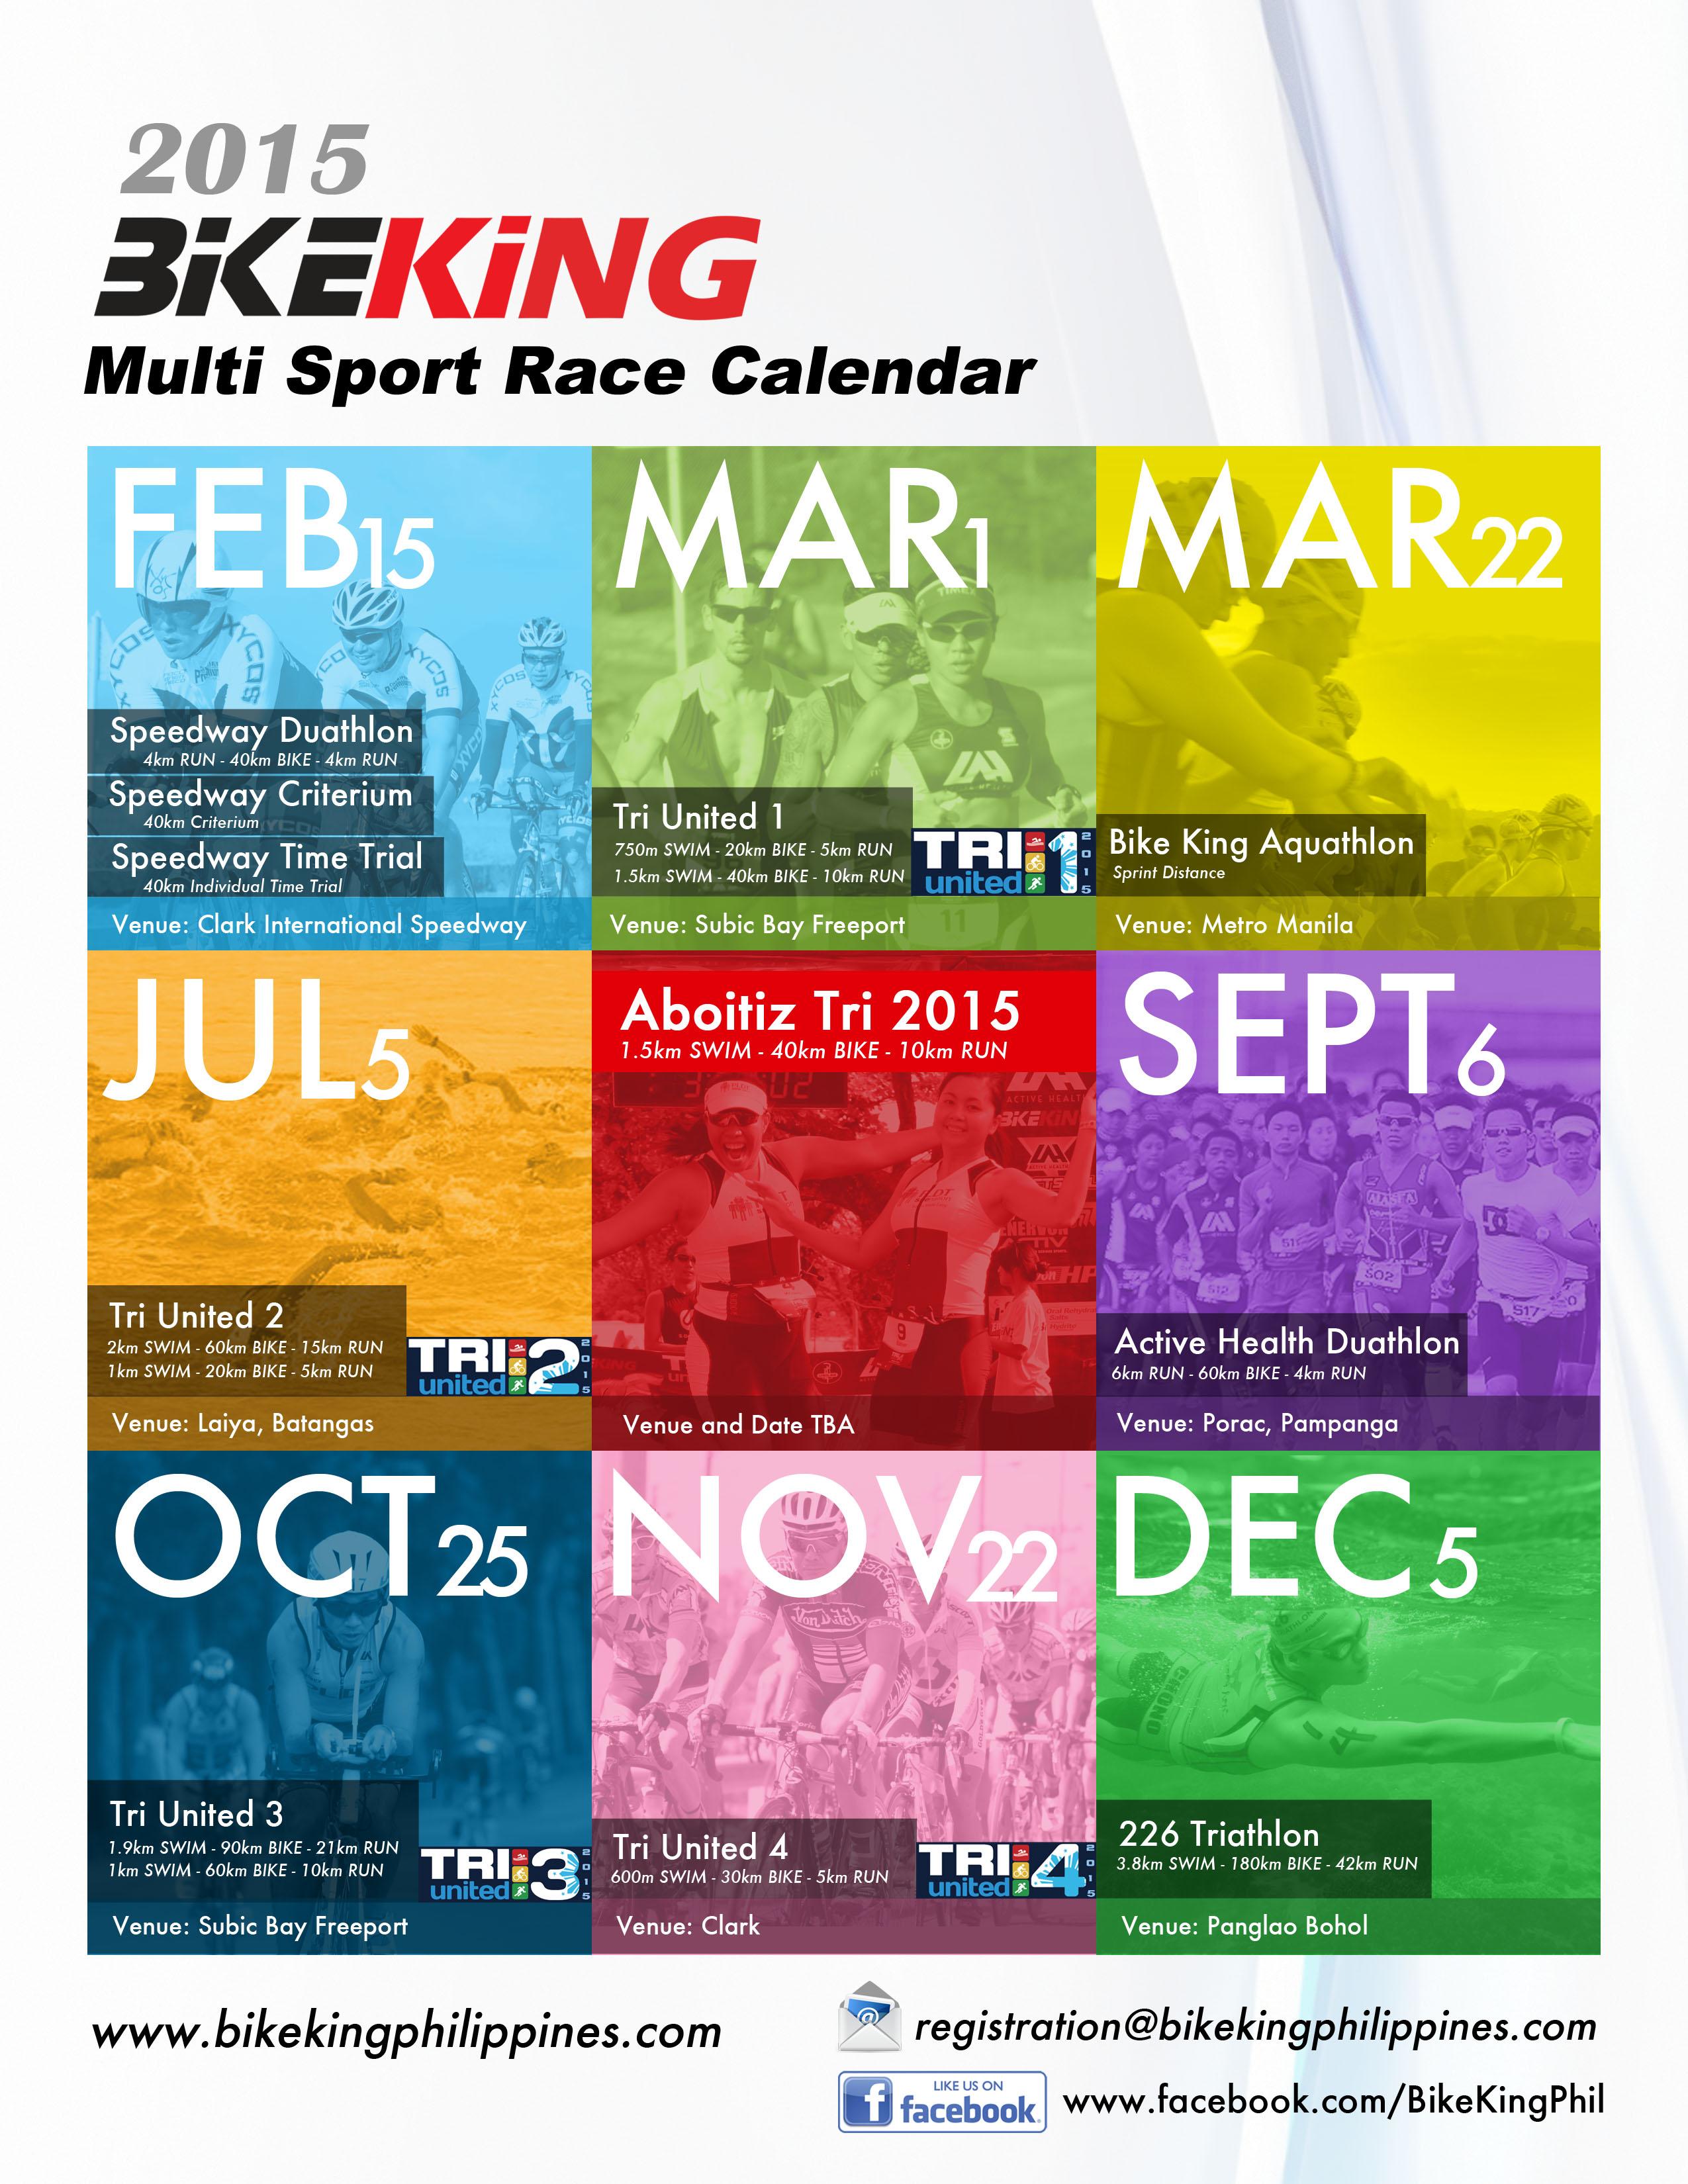 Race Calendar.Bike King Race Calendar For 2015 Pinoy Fitness